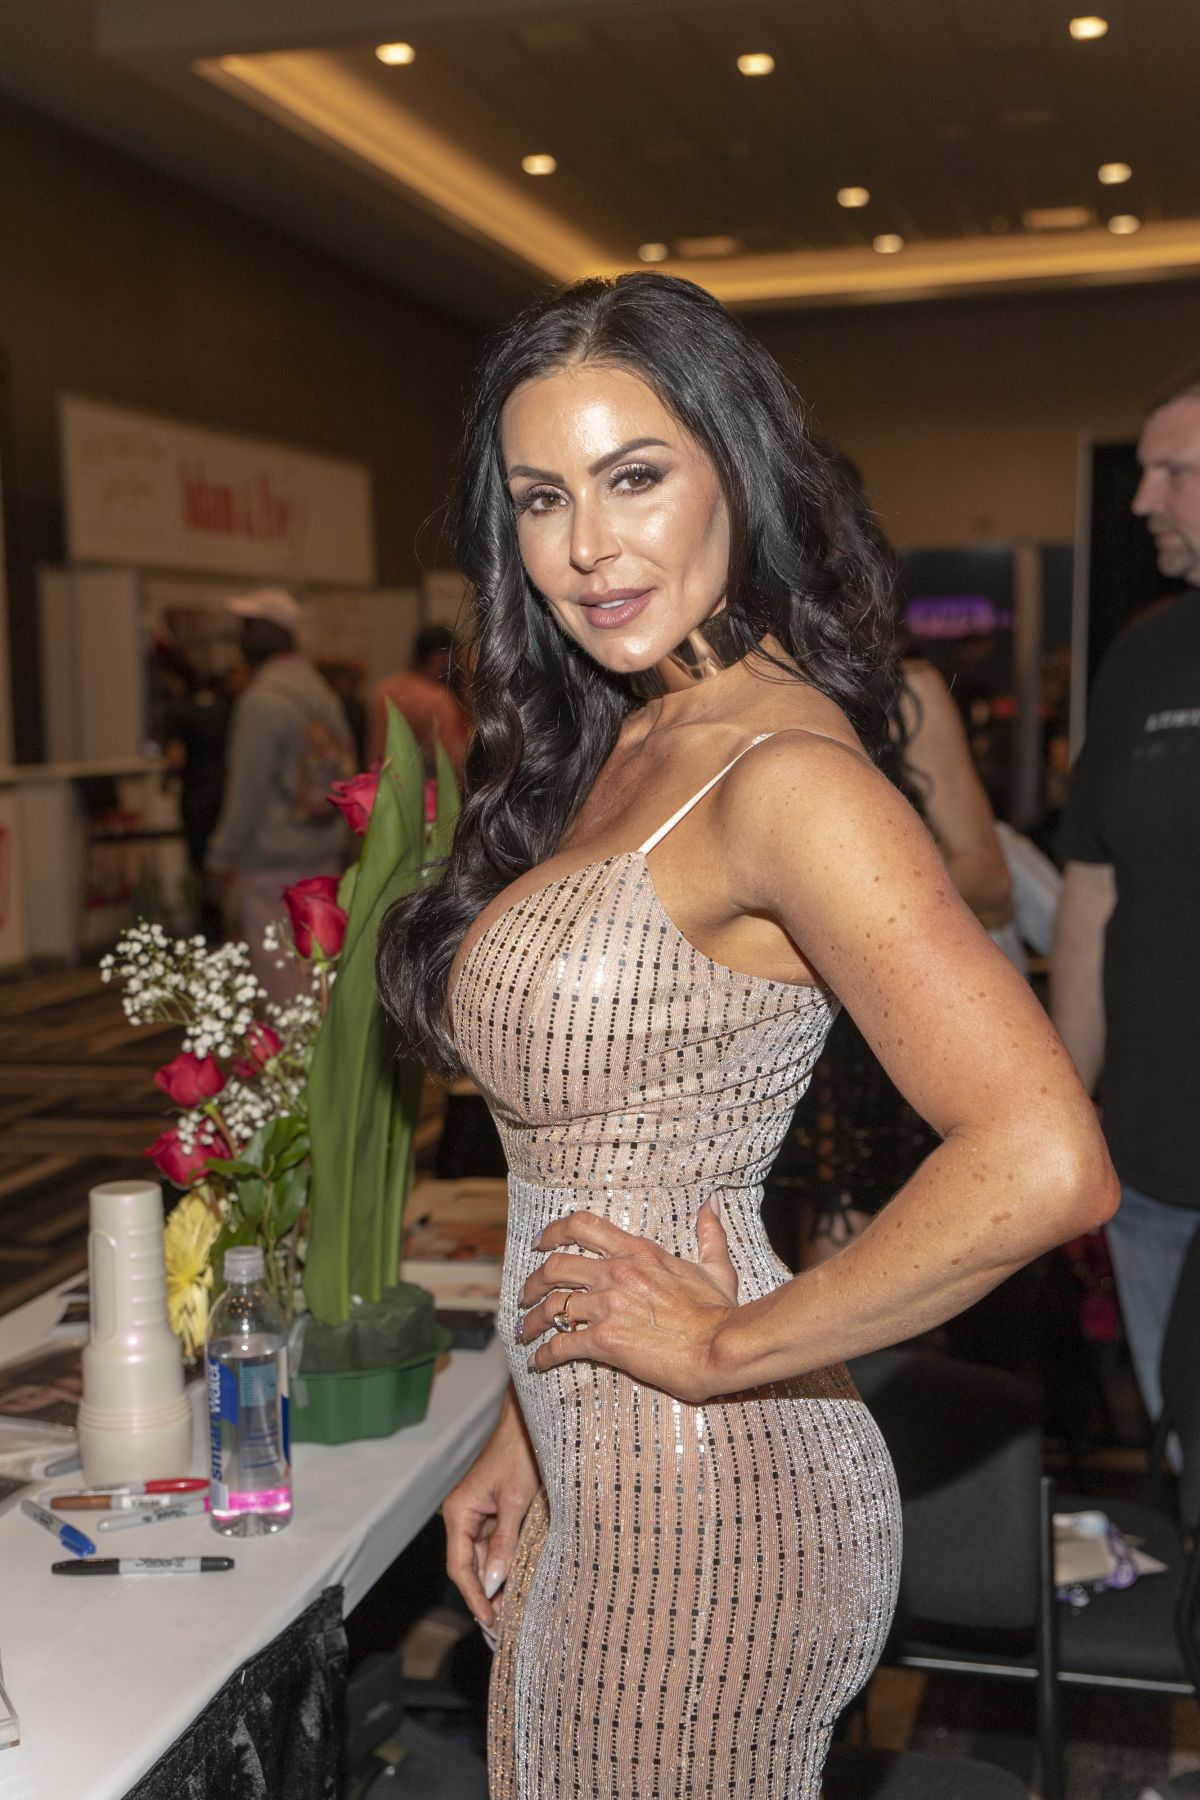 KENDRA LUST at 2019 AVN Expo in Las Vegas 01/24/2019